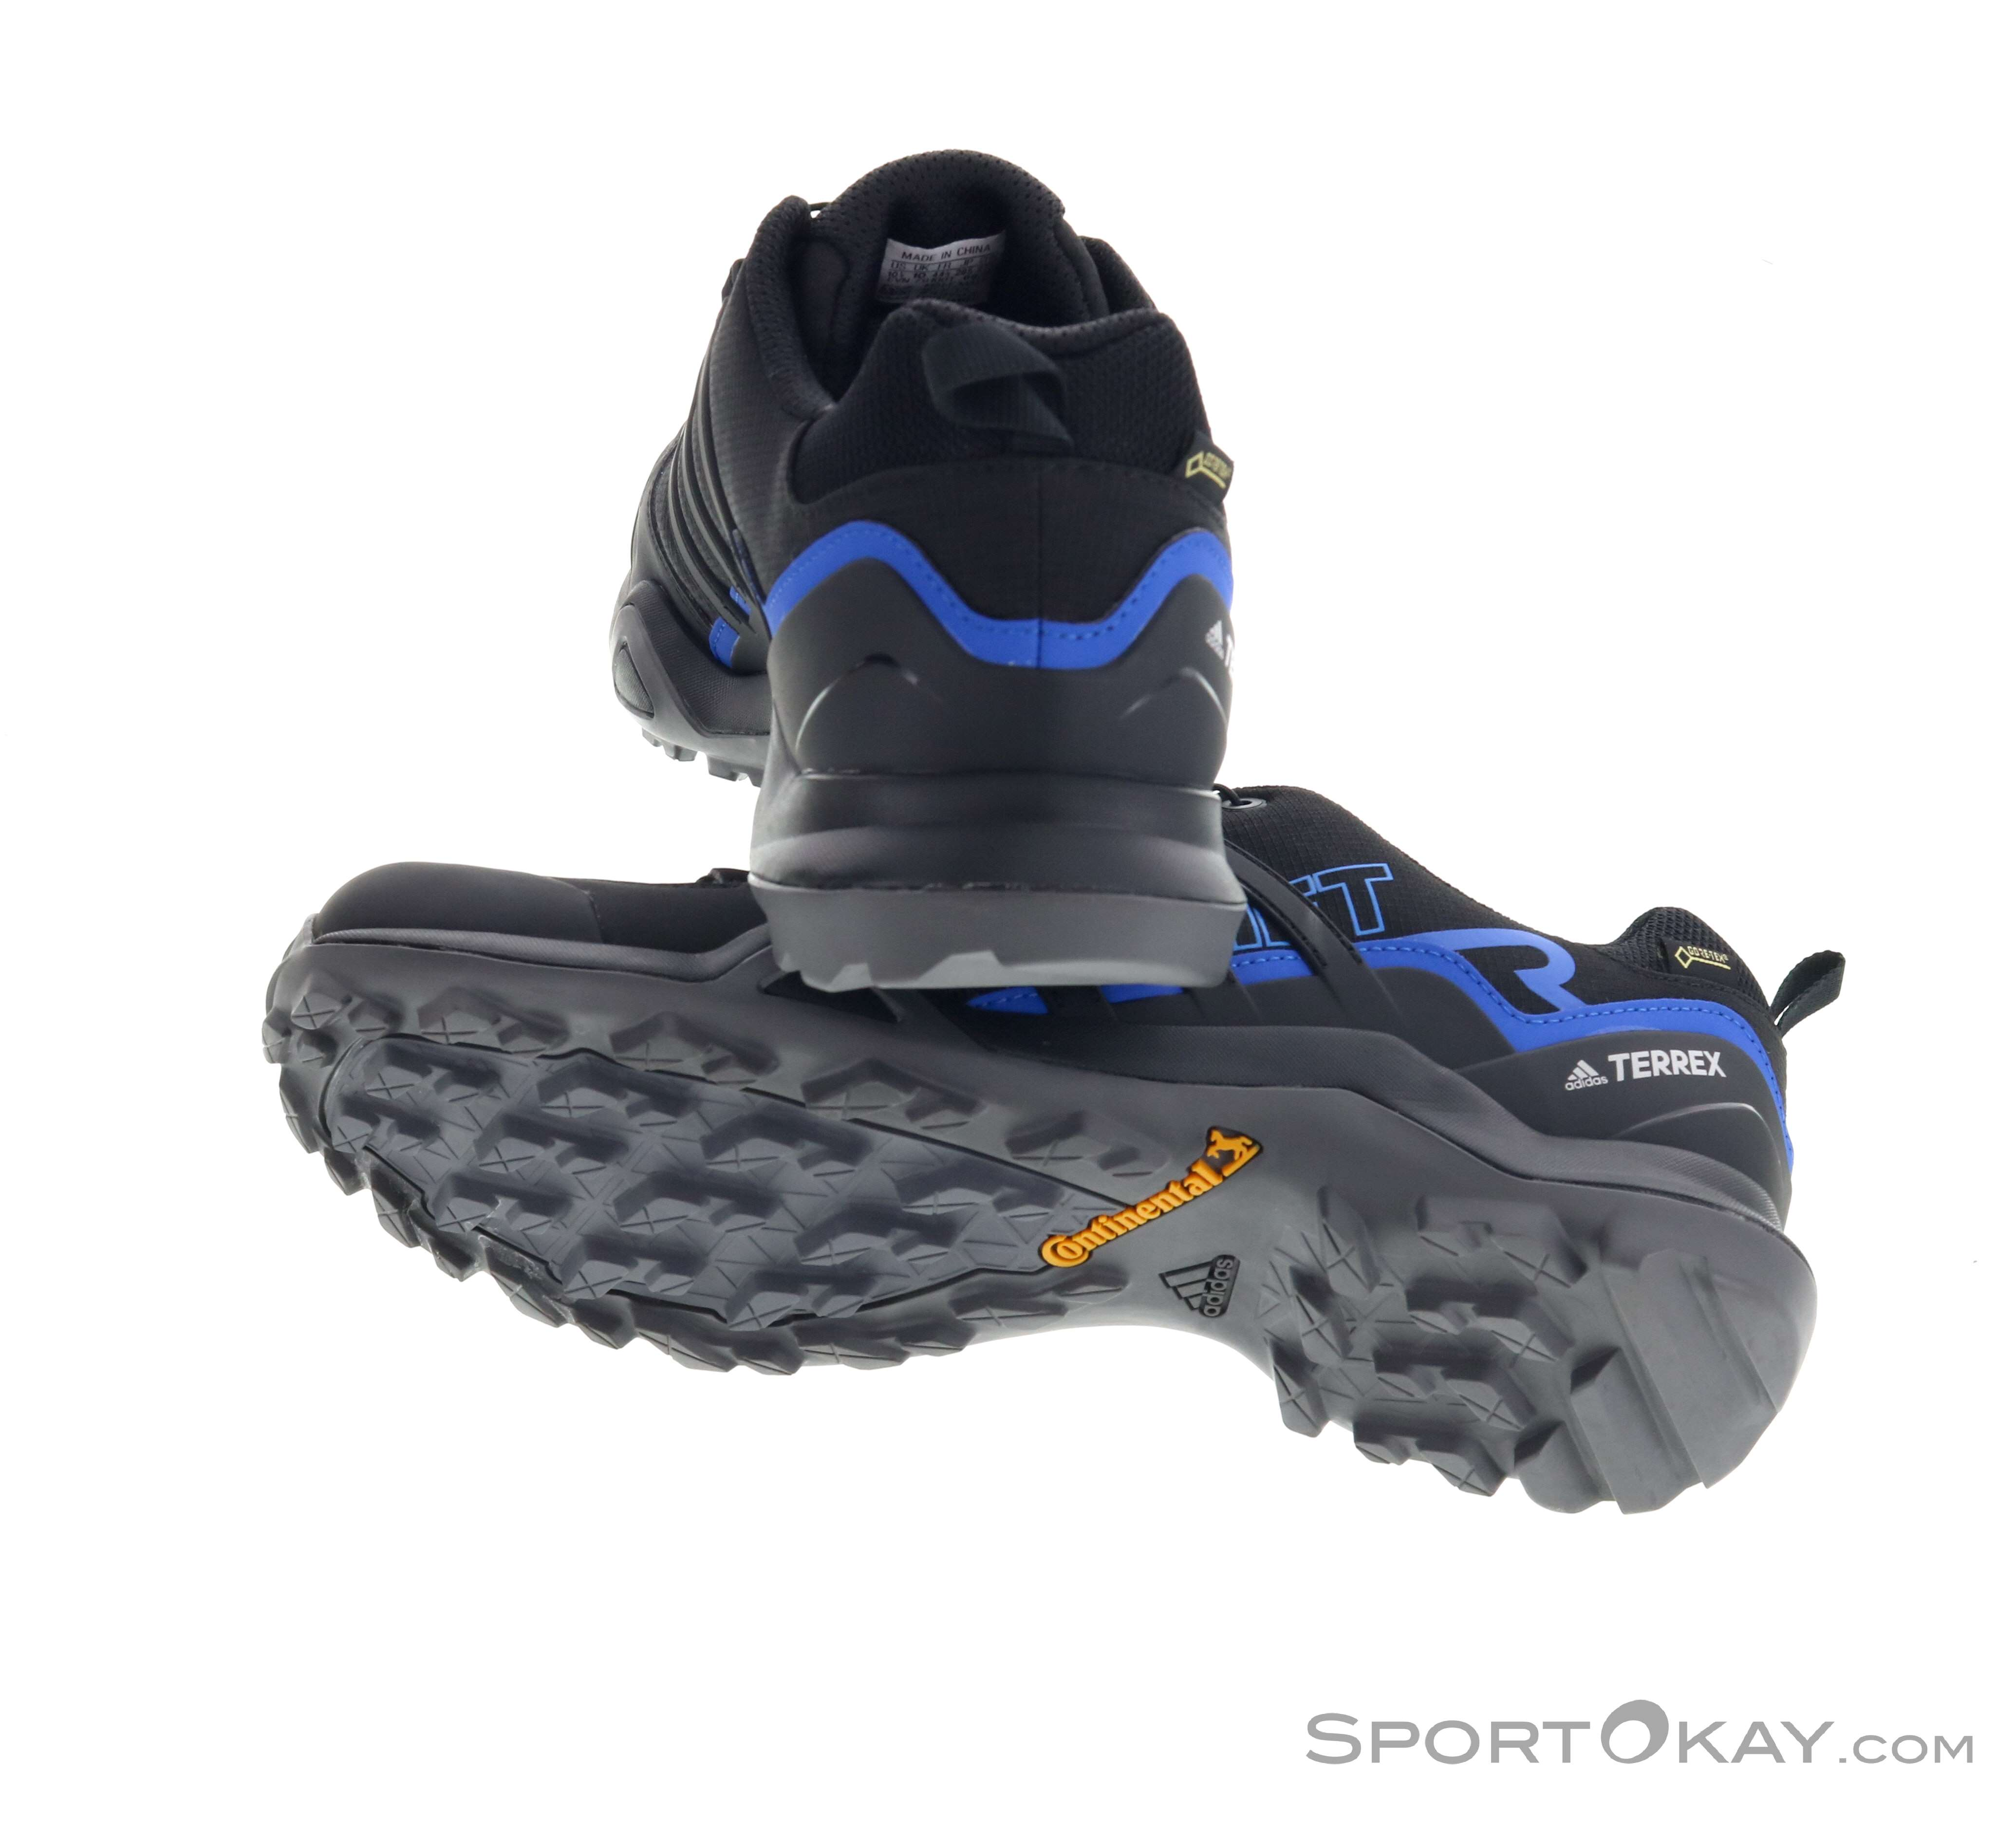 8926c6f424e21 adidas Terrex Swift R2 GTX Mens Trekking Shoes Gore-Tex - Trekking ...